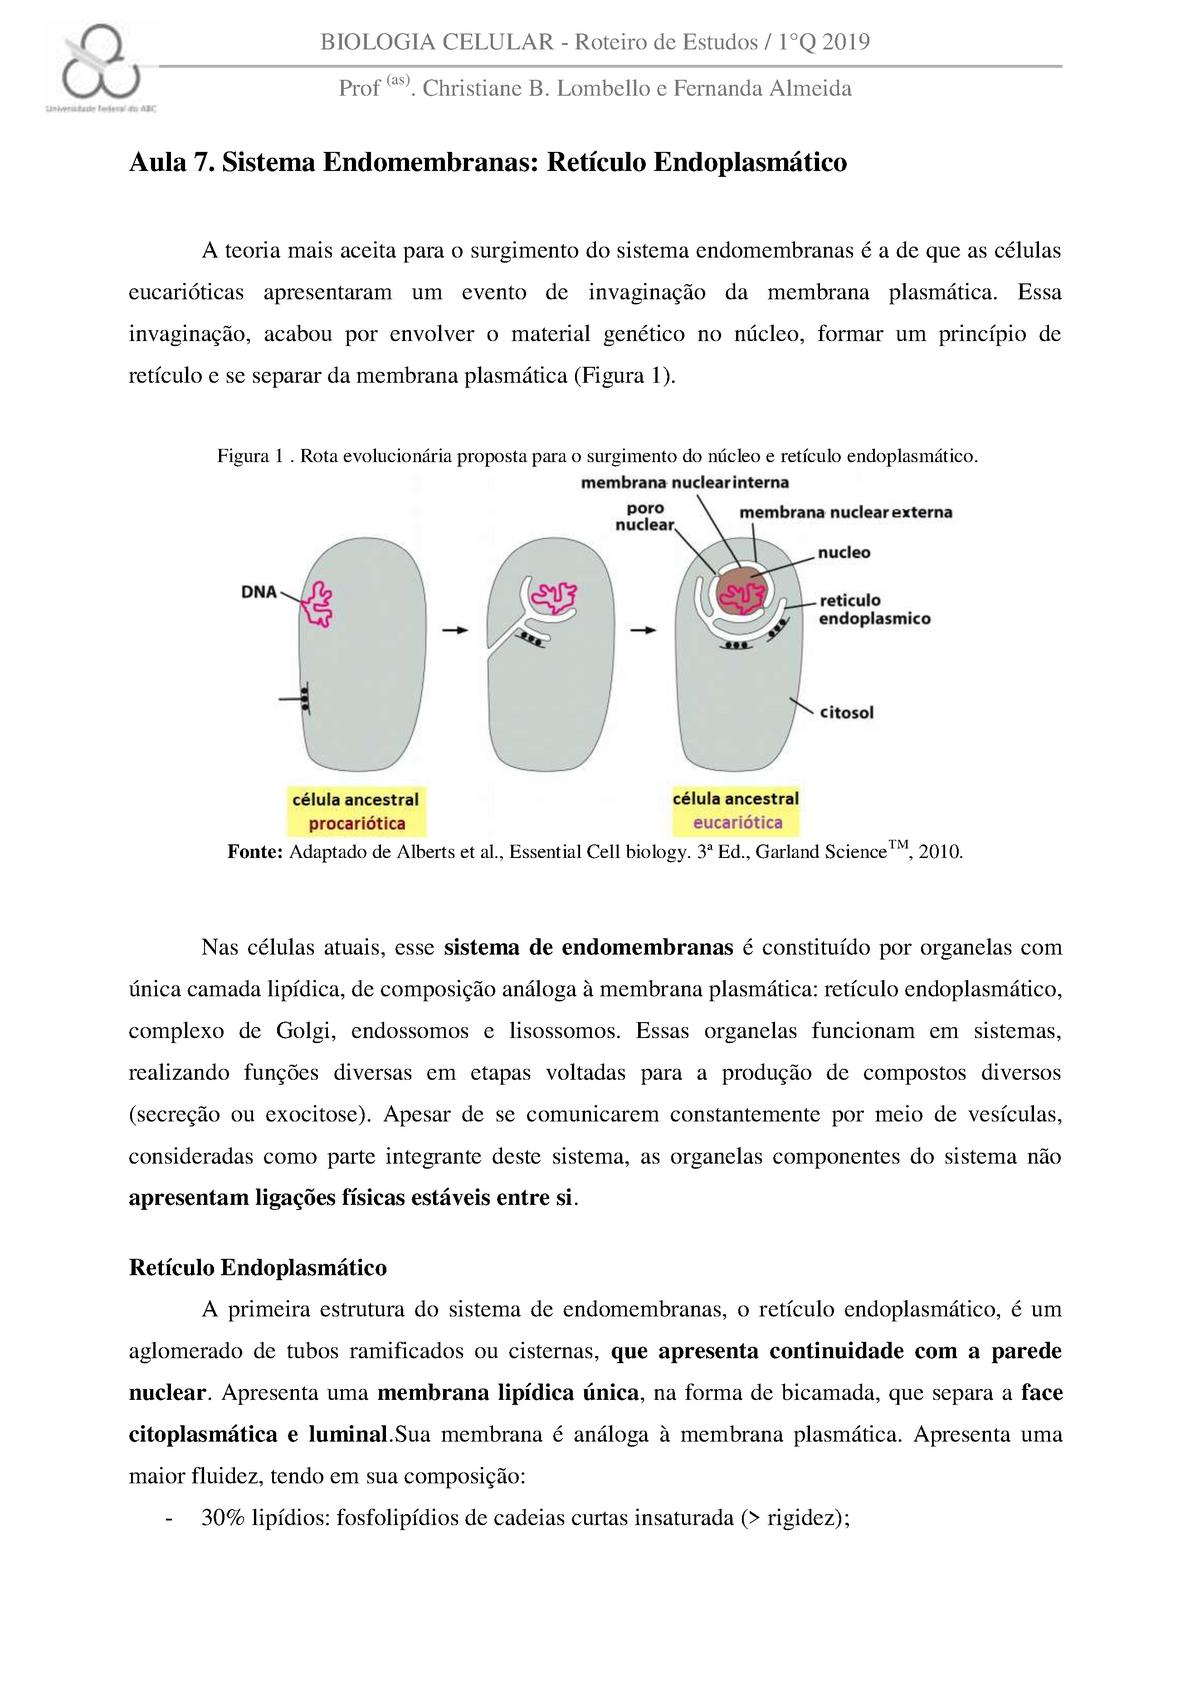 Aula 7 Sistema Endomembranas Biologia Celular Nht1053 15